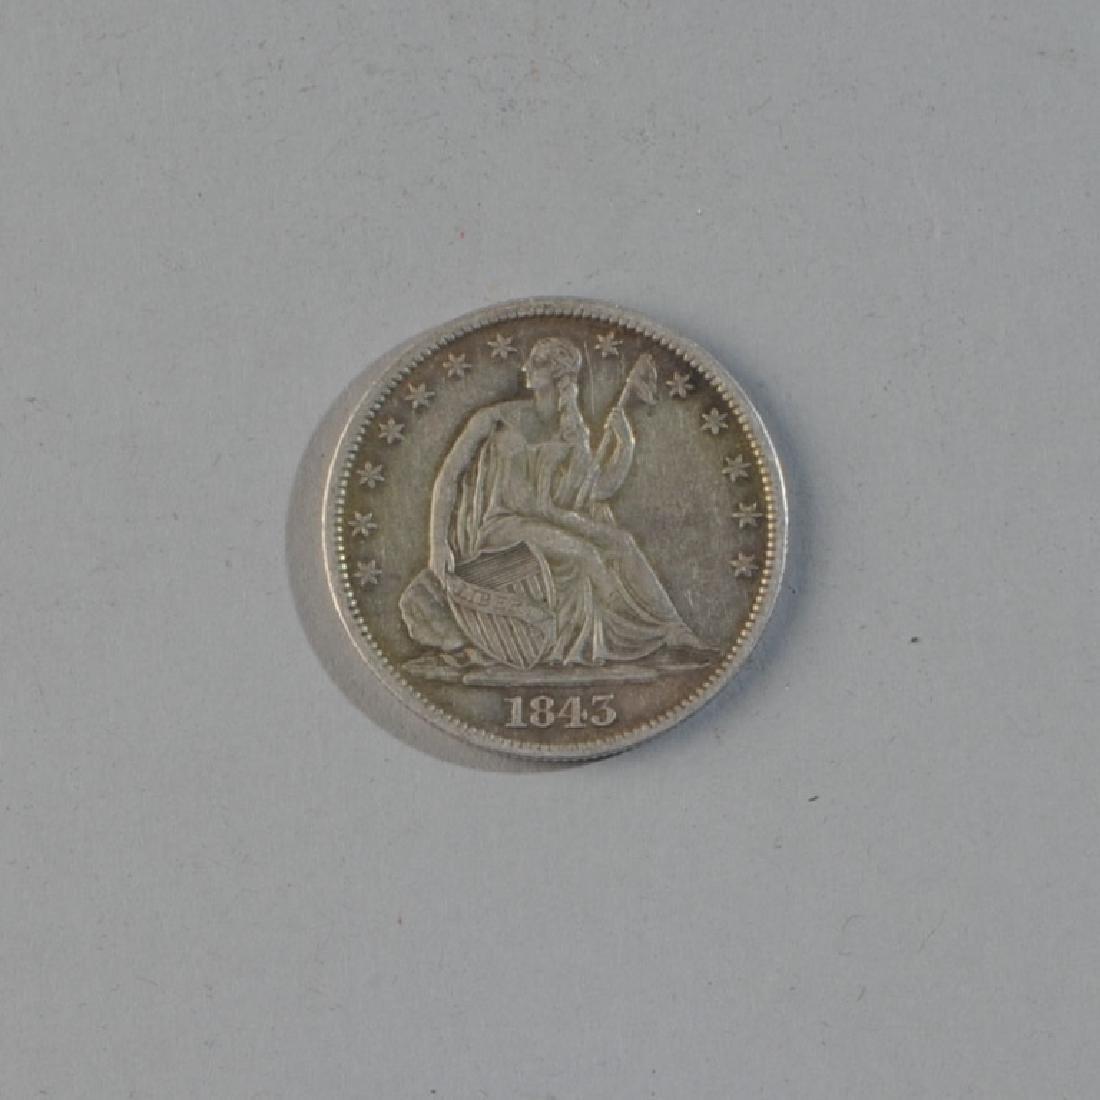 1843 Liberty Seated Half Dollar